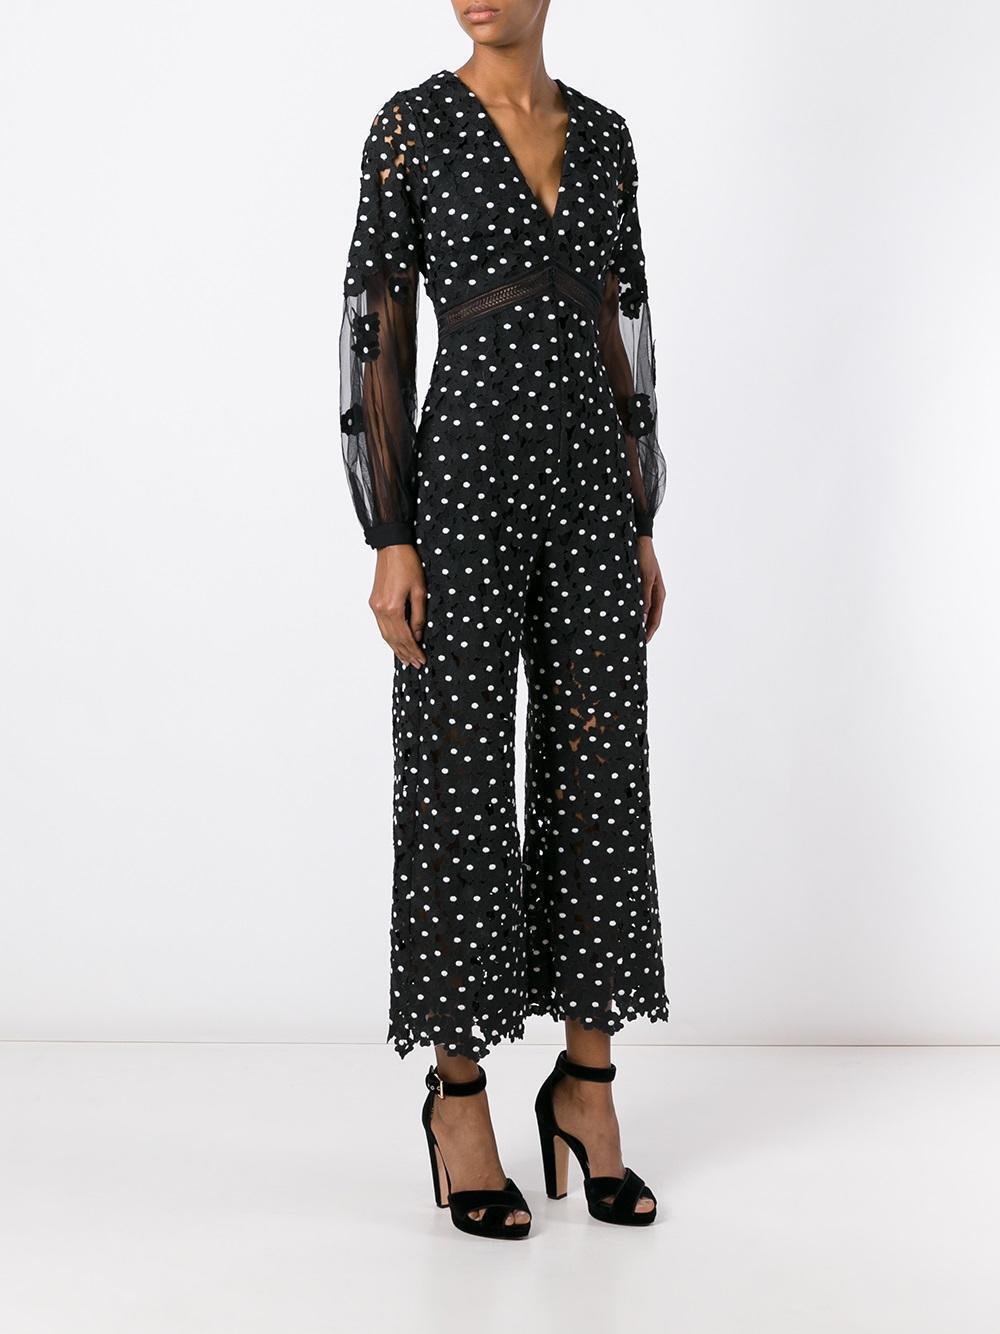 Self Portrait Lace Daisy Dot Jumpsuit Romper Dress Brand New BNWT IT 38